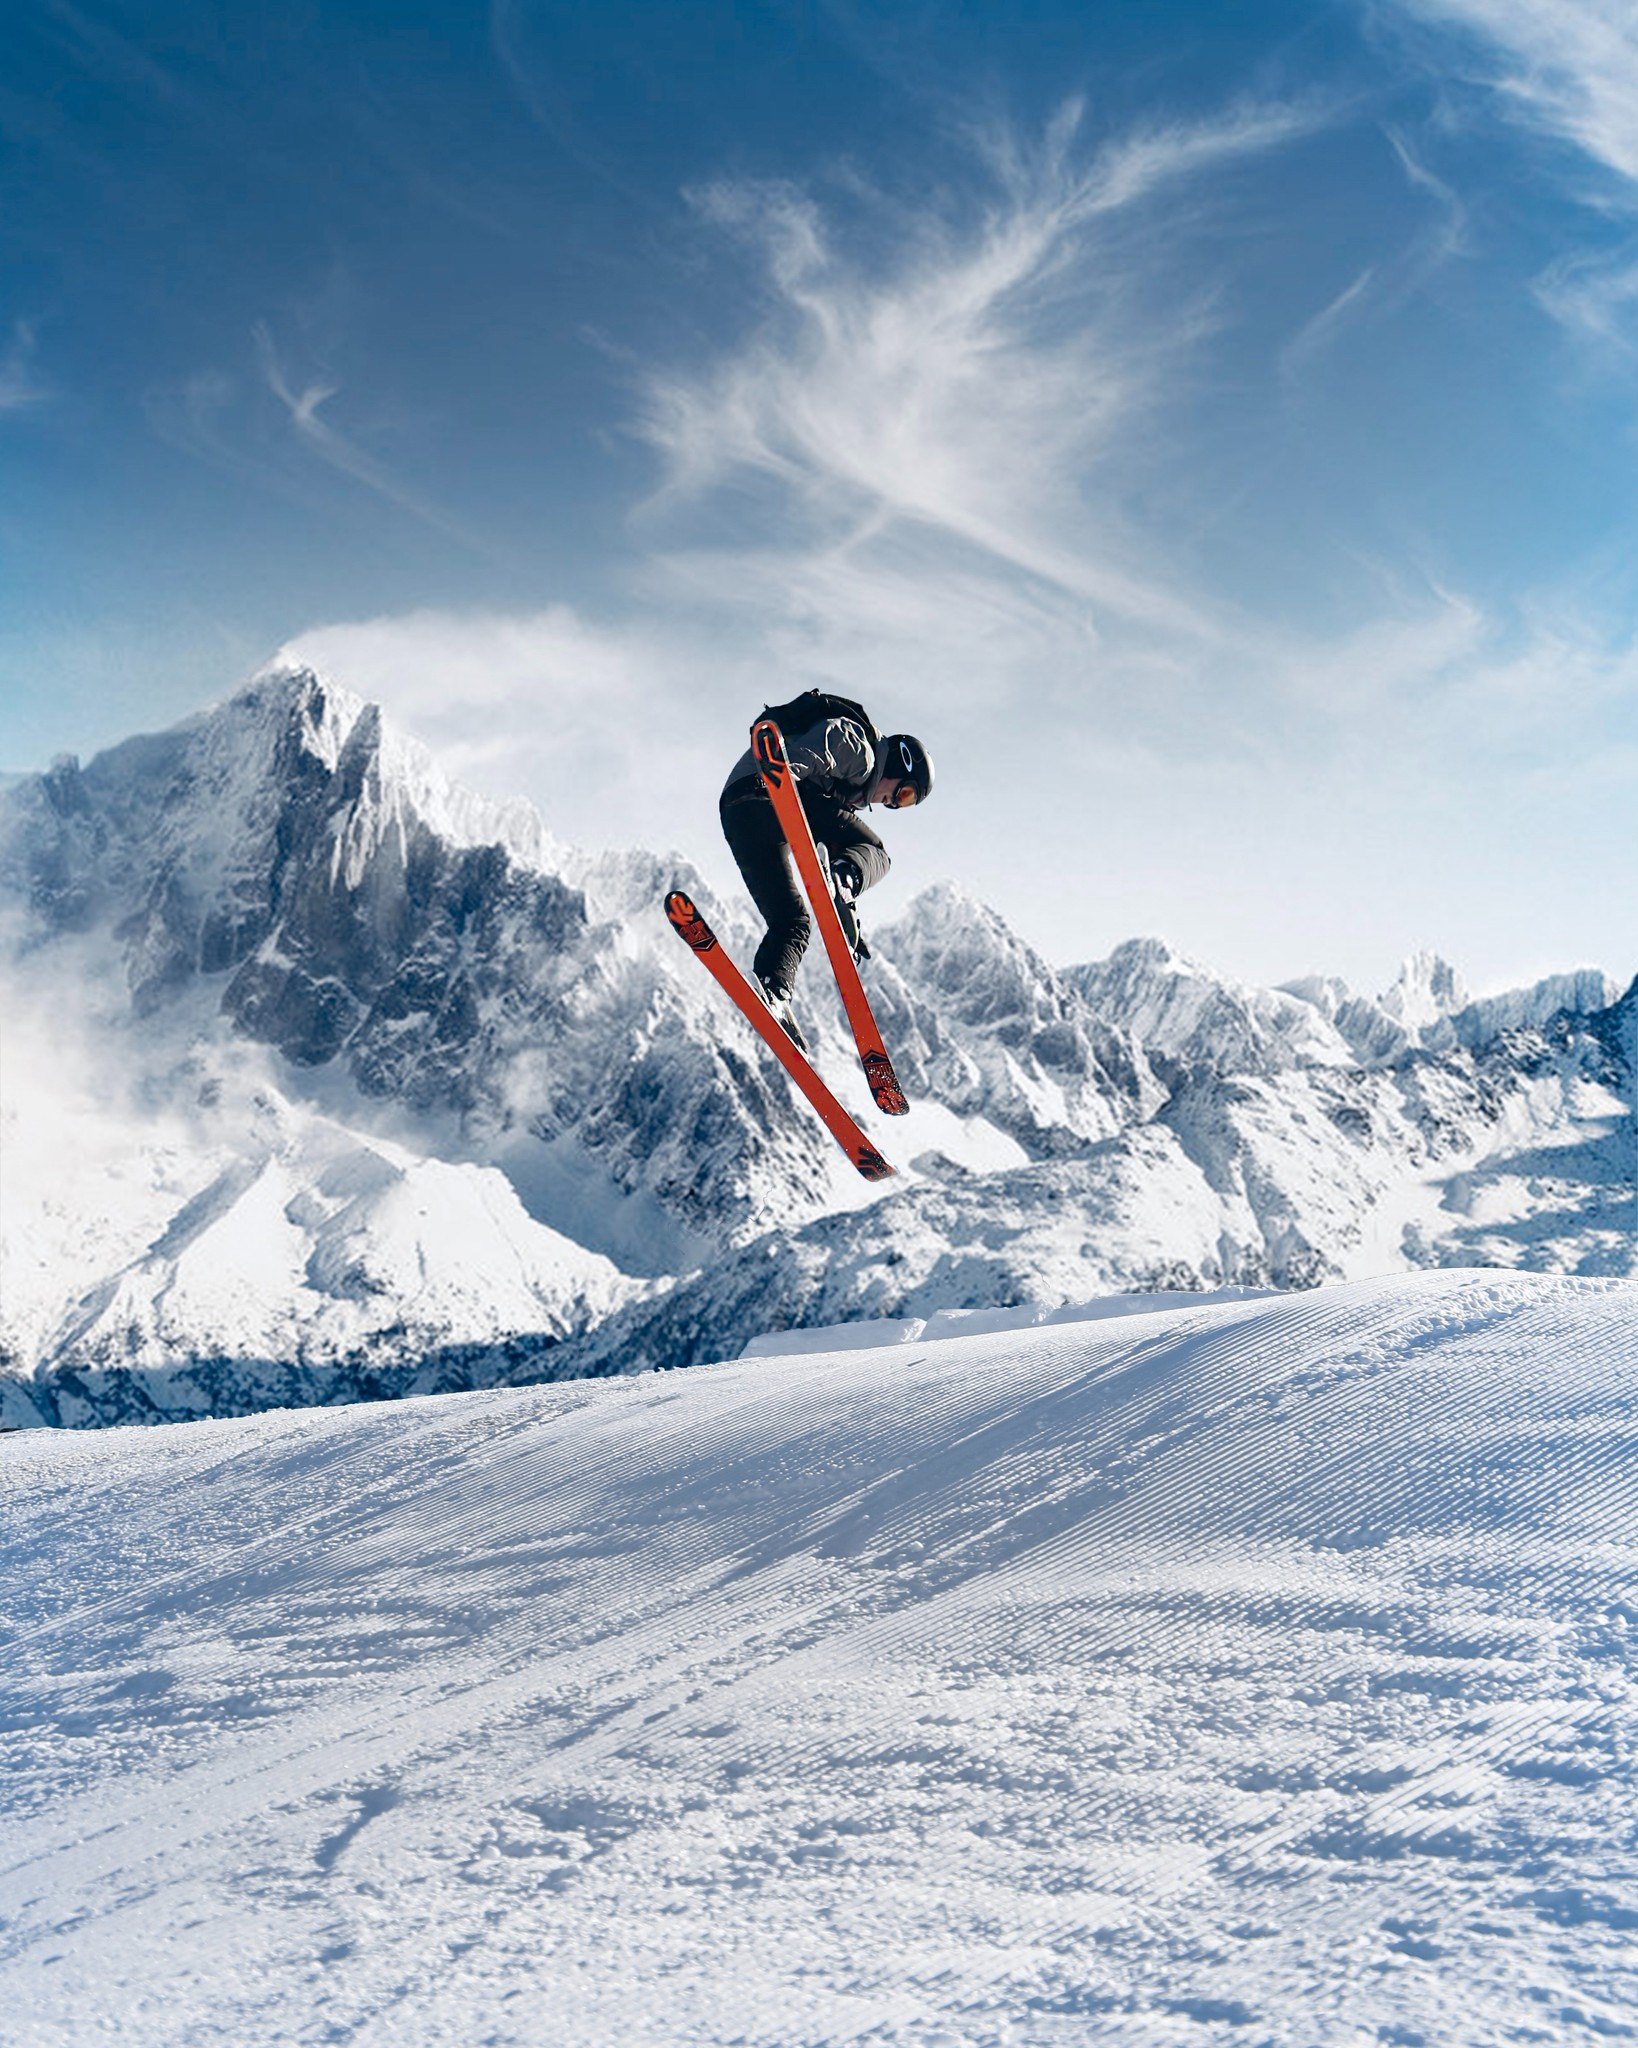 What type of ski do I need?